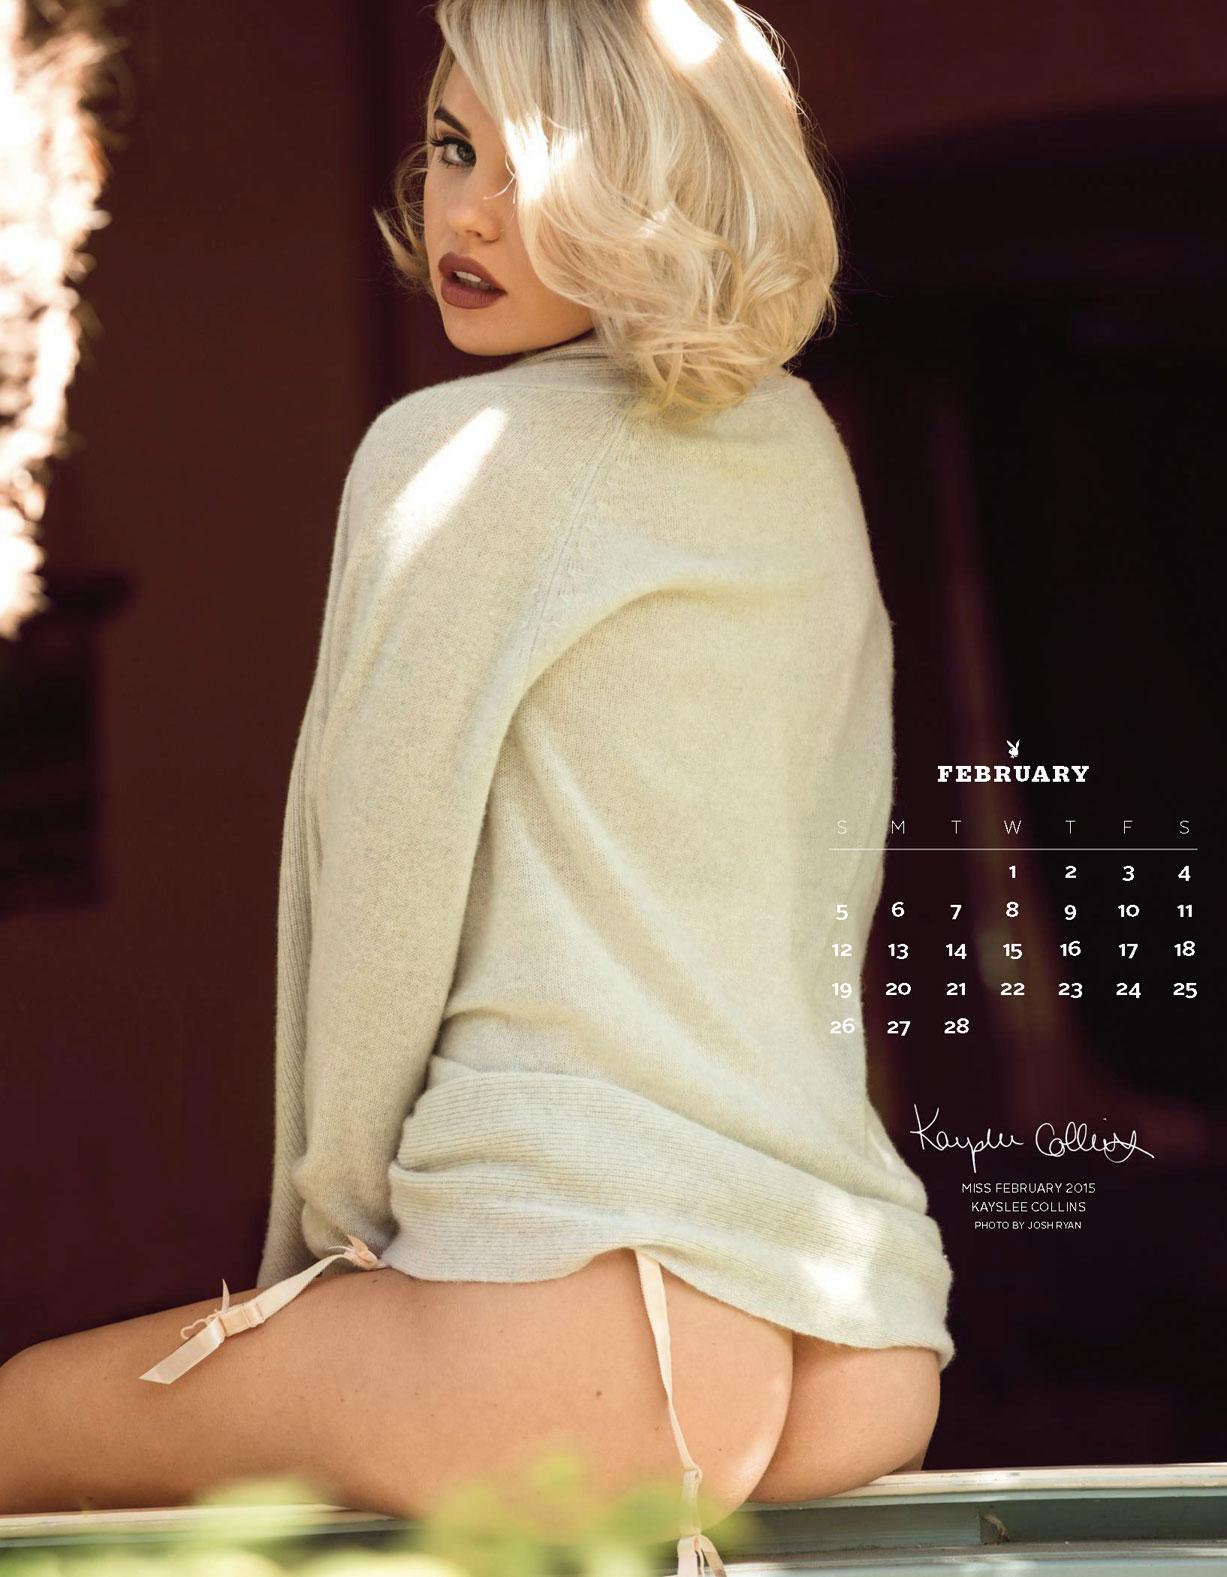 Playboy US Playmates 2017 calendar - Miss February 2015 Kayslee Collins / Кейсли Коллинс – Девушка месяца февраль 2015 журнала Плейбой США